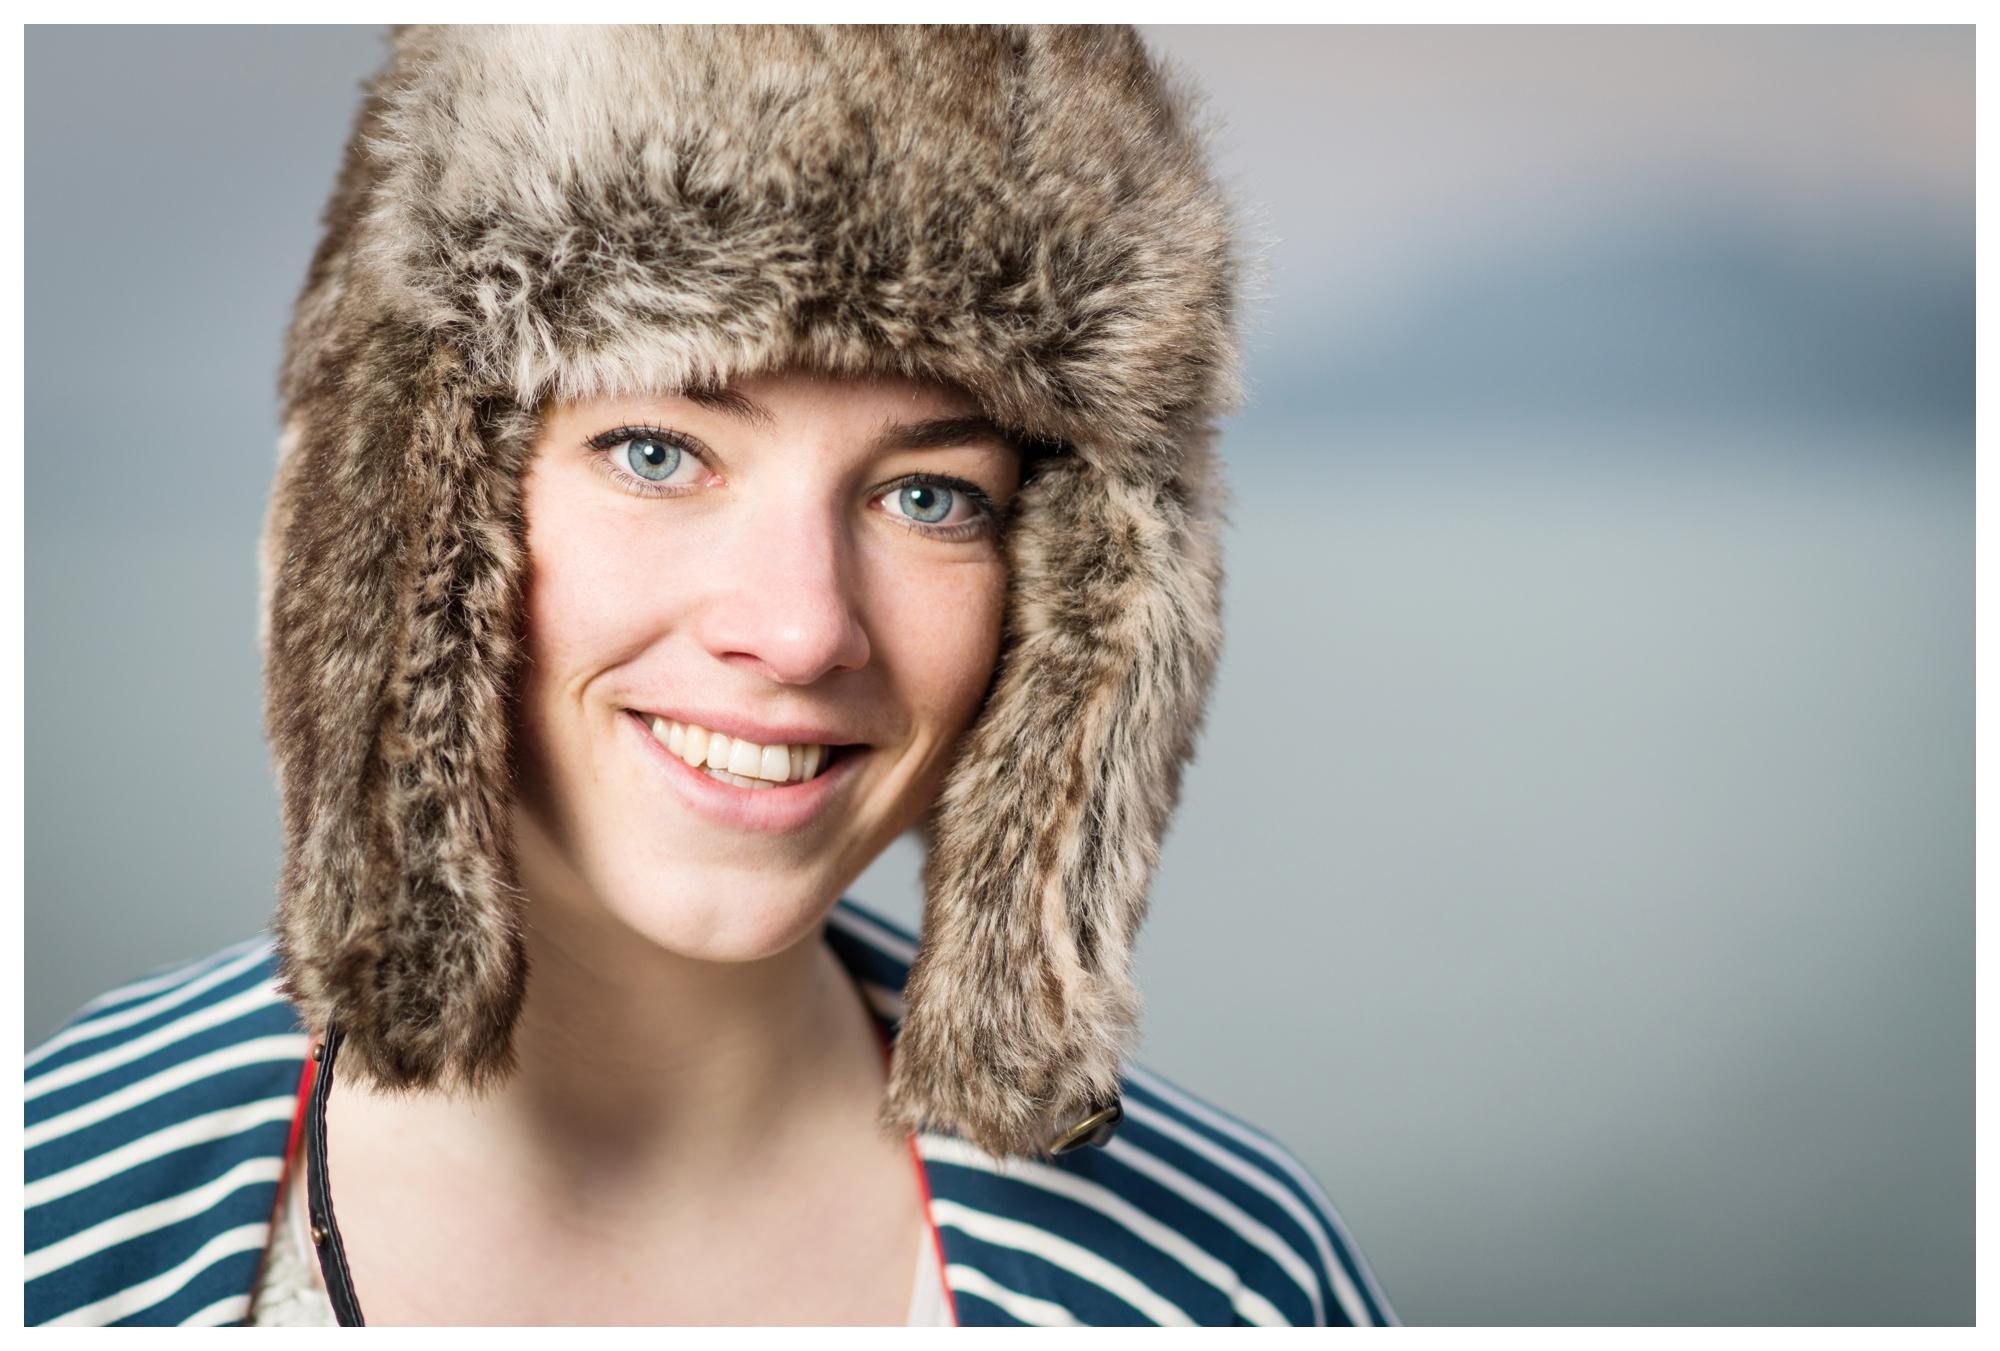 Fotograf Konstanz - EFP Portrait Paar Fotografie Bodensee Mainau 18 - Paar Shooting auf der Mainau  - 8 -